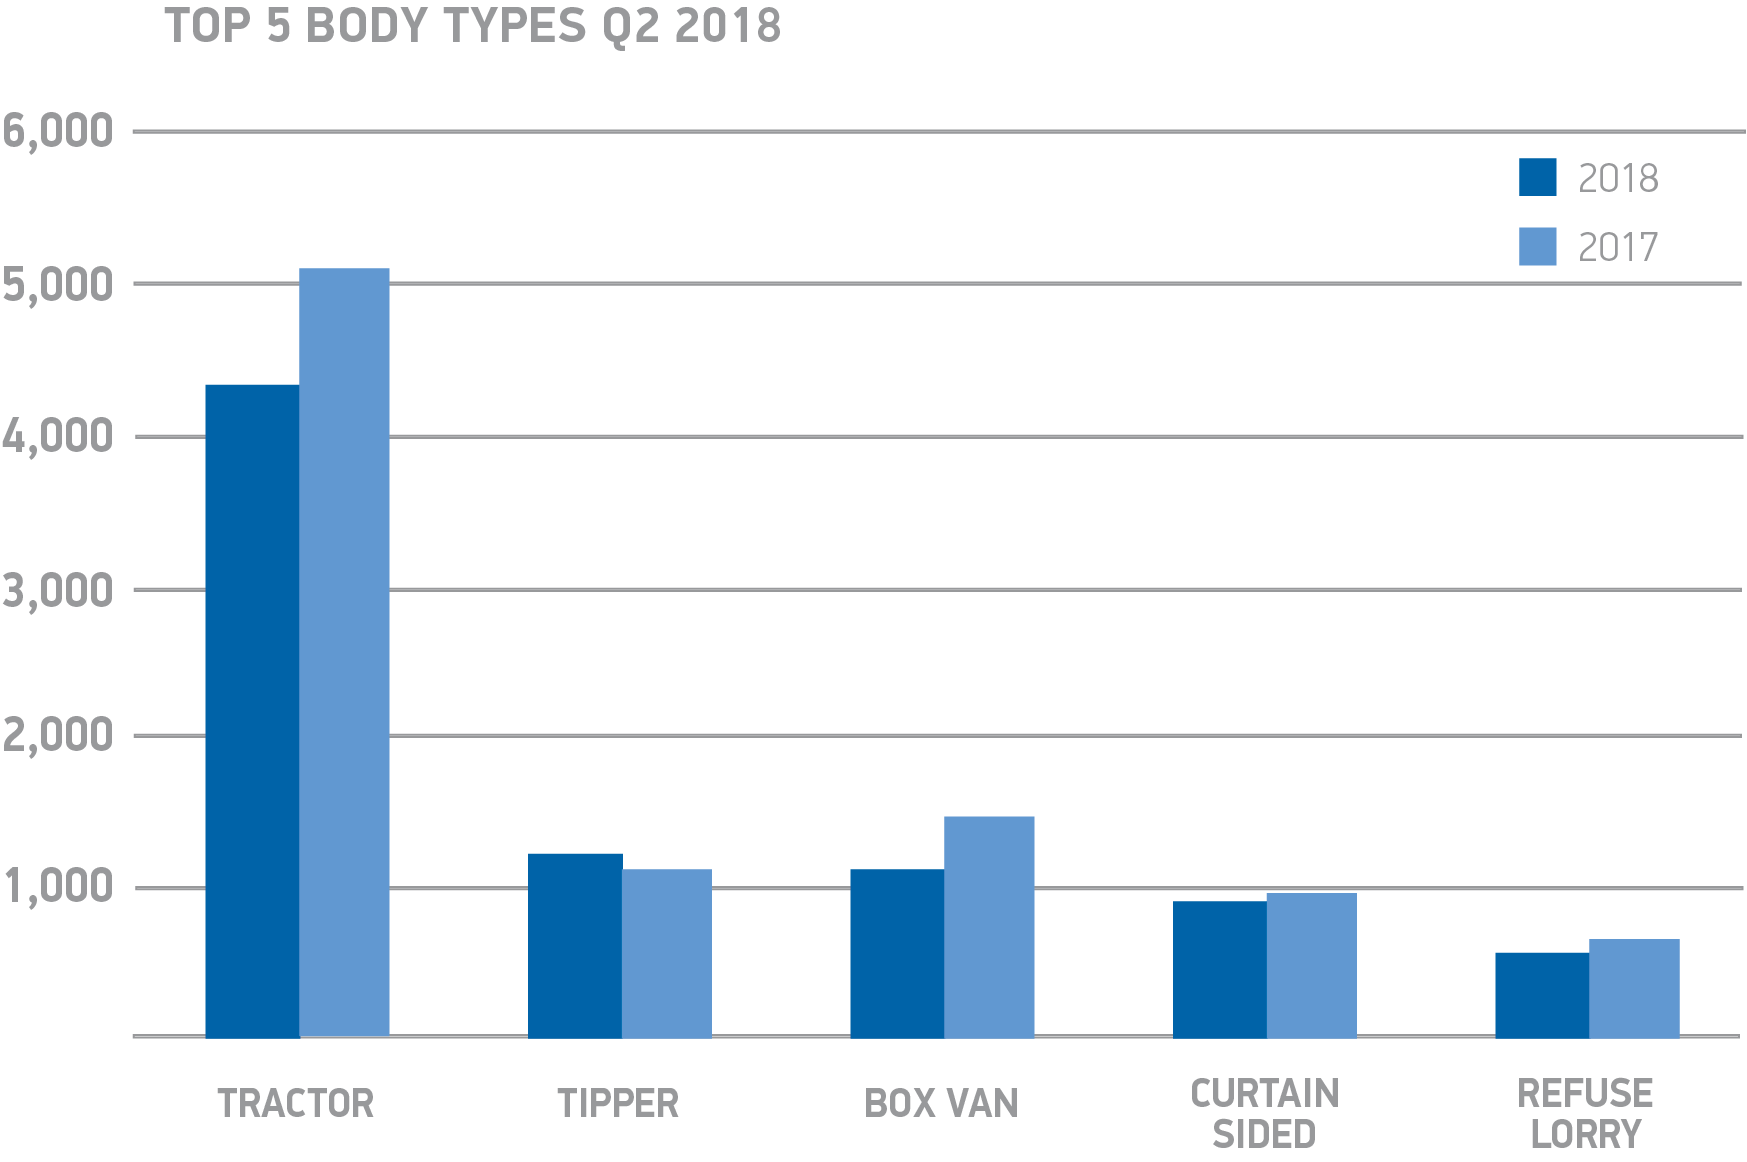 Top 5 HGV body types chart q2 2018